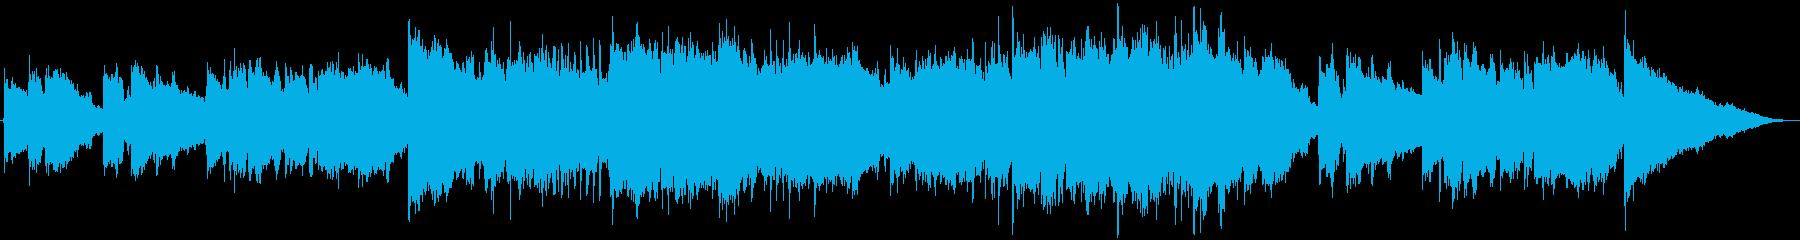 CM・優しいフューチャーポップの再生済みの波形